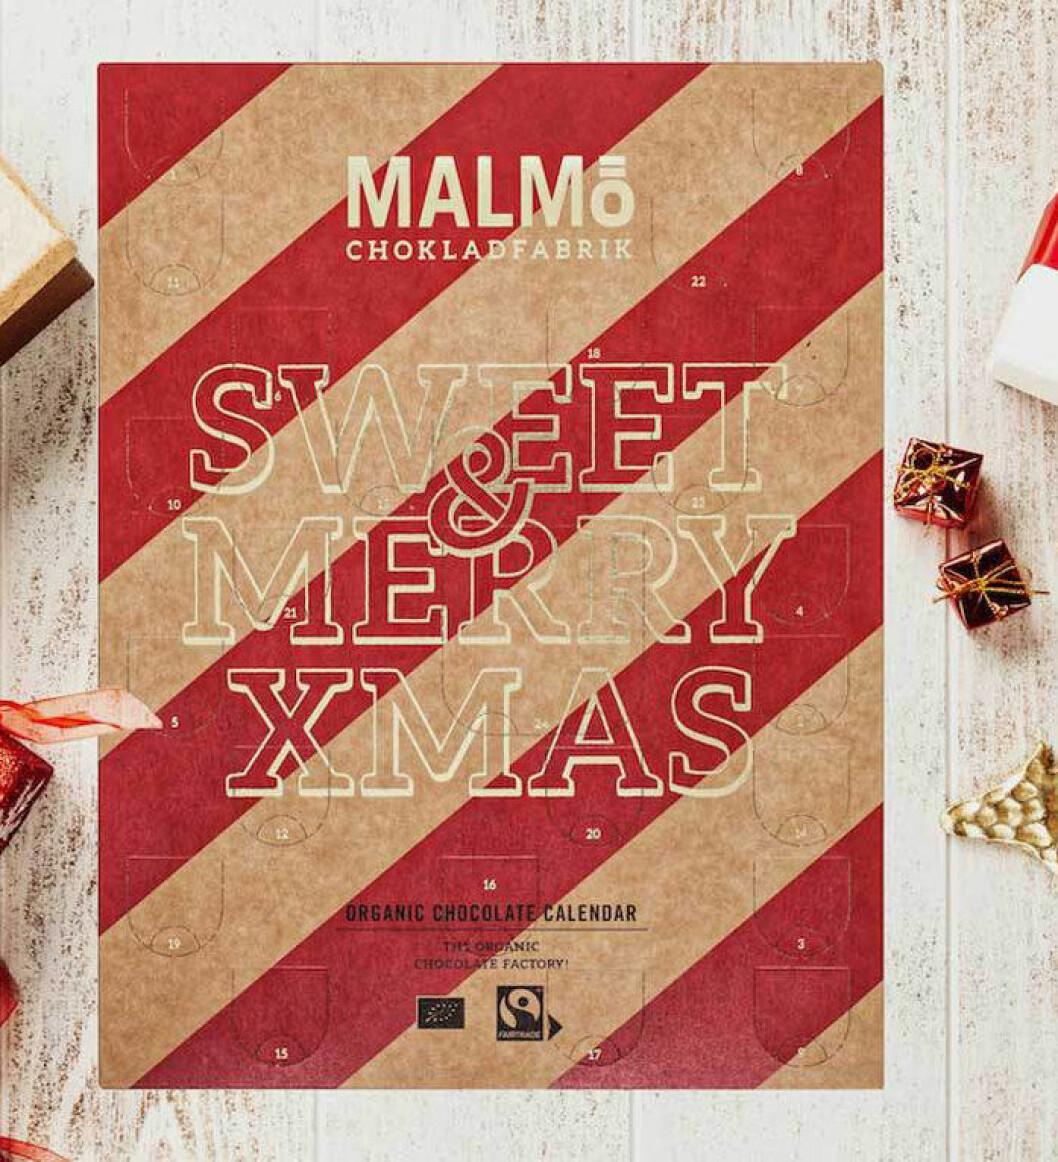 Adventskalender från Malmö Chokladfabrik.